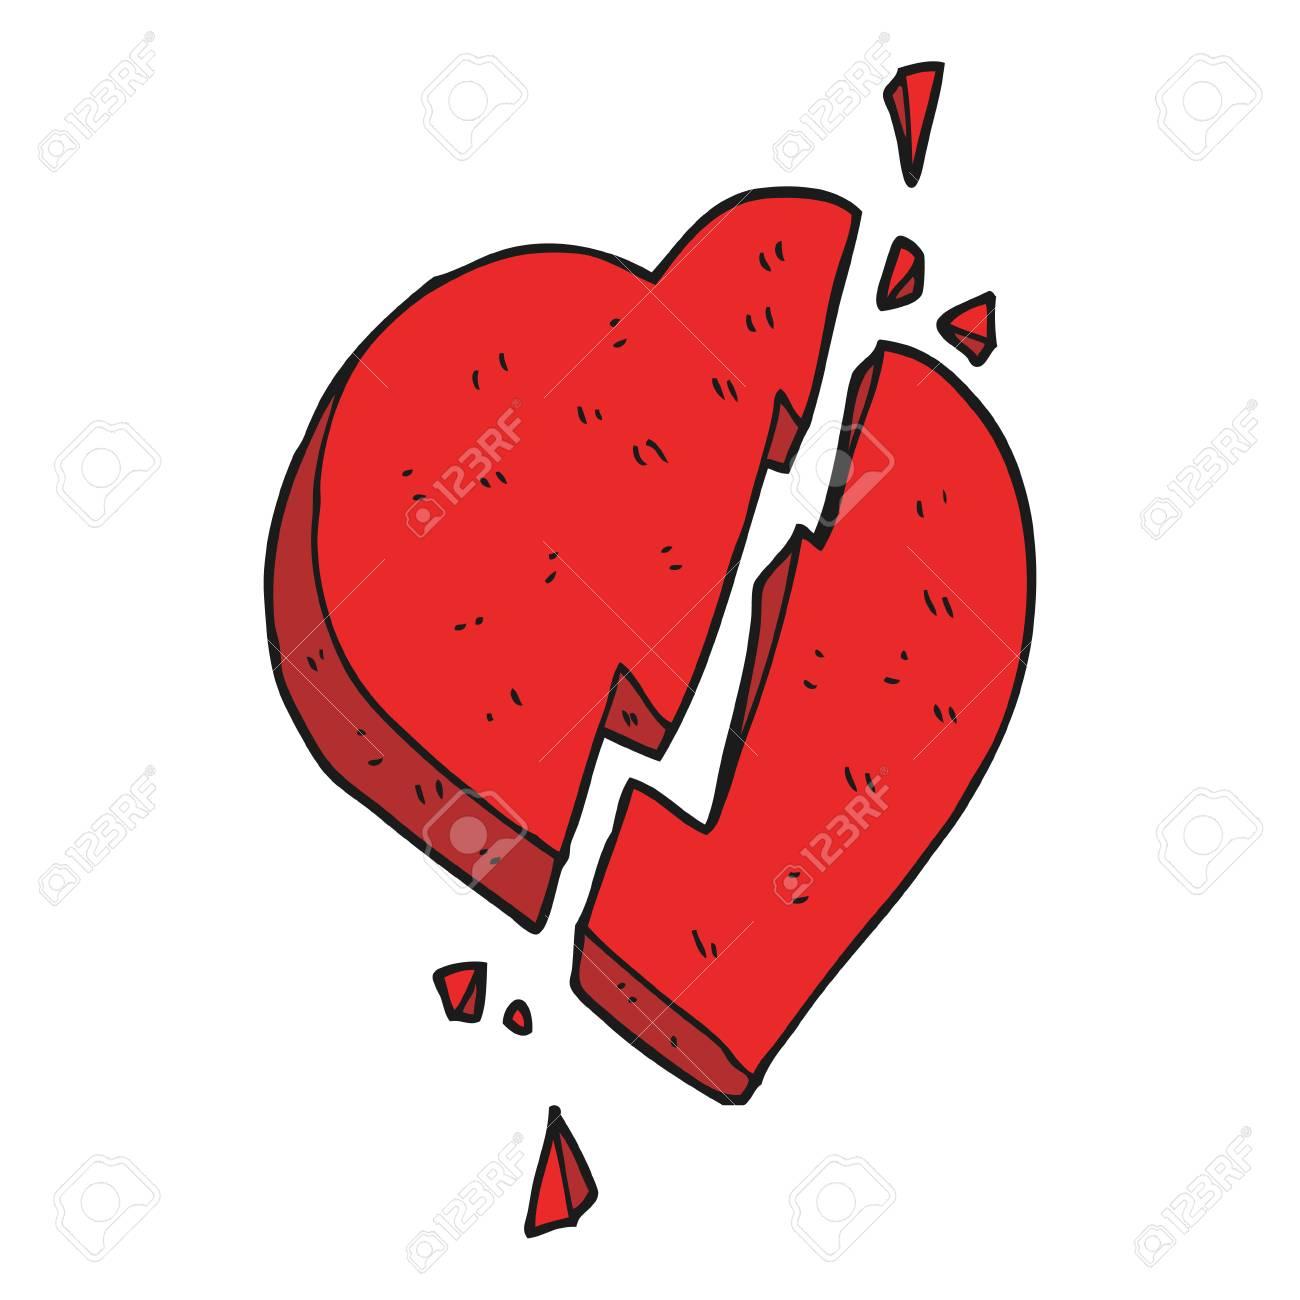 freehand drawn cartoon broken heart symbol royalty free cliparts rh 123rf com cartoon broken heart pic cartoon broken heart pic